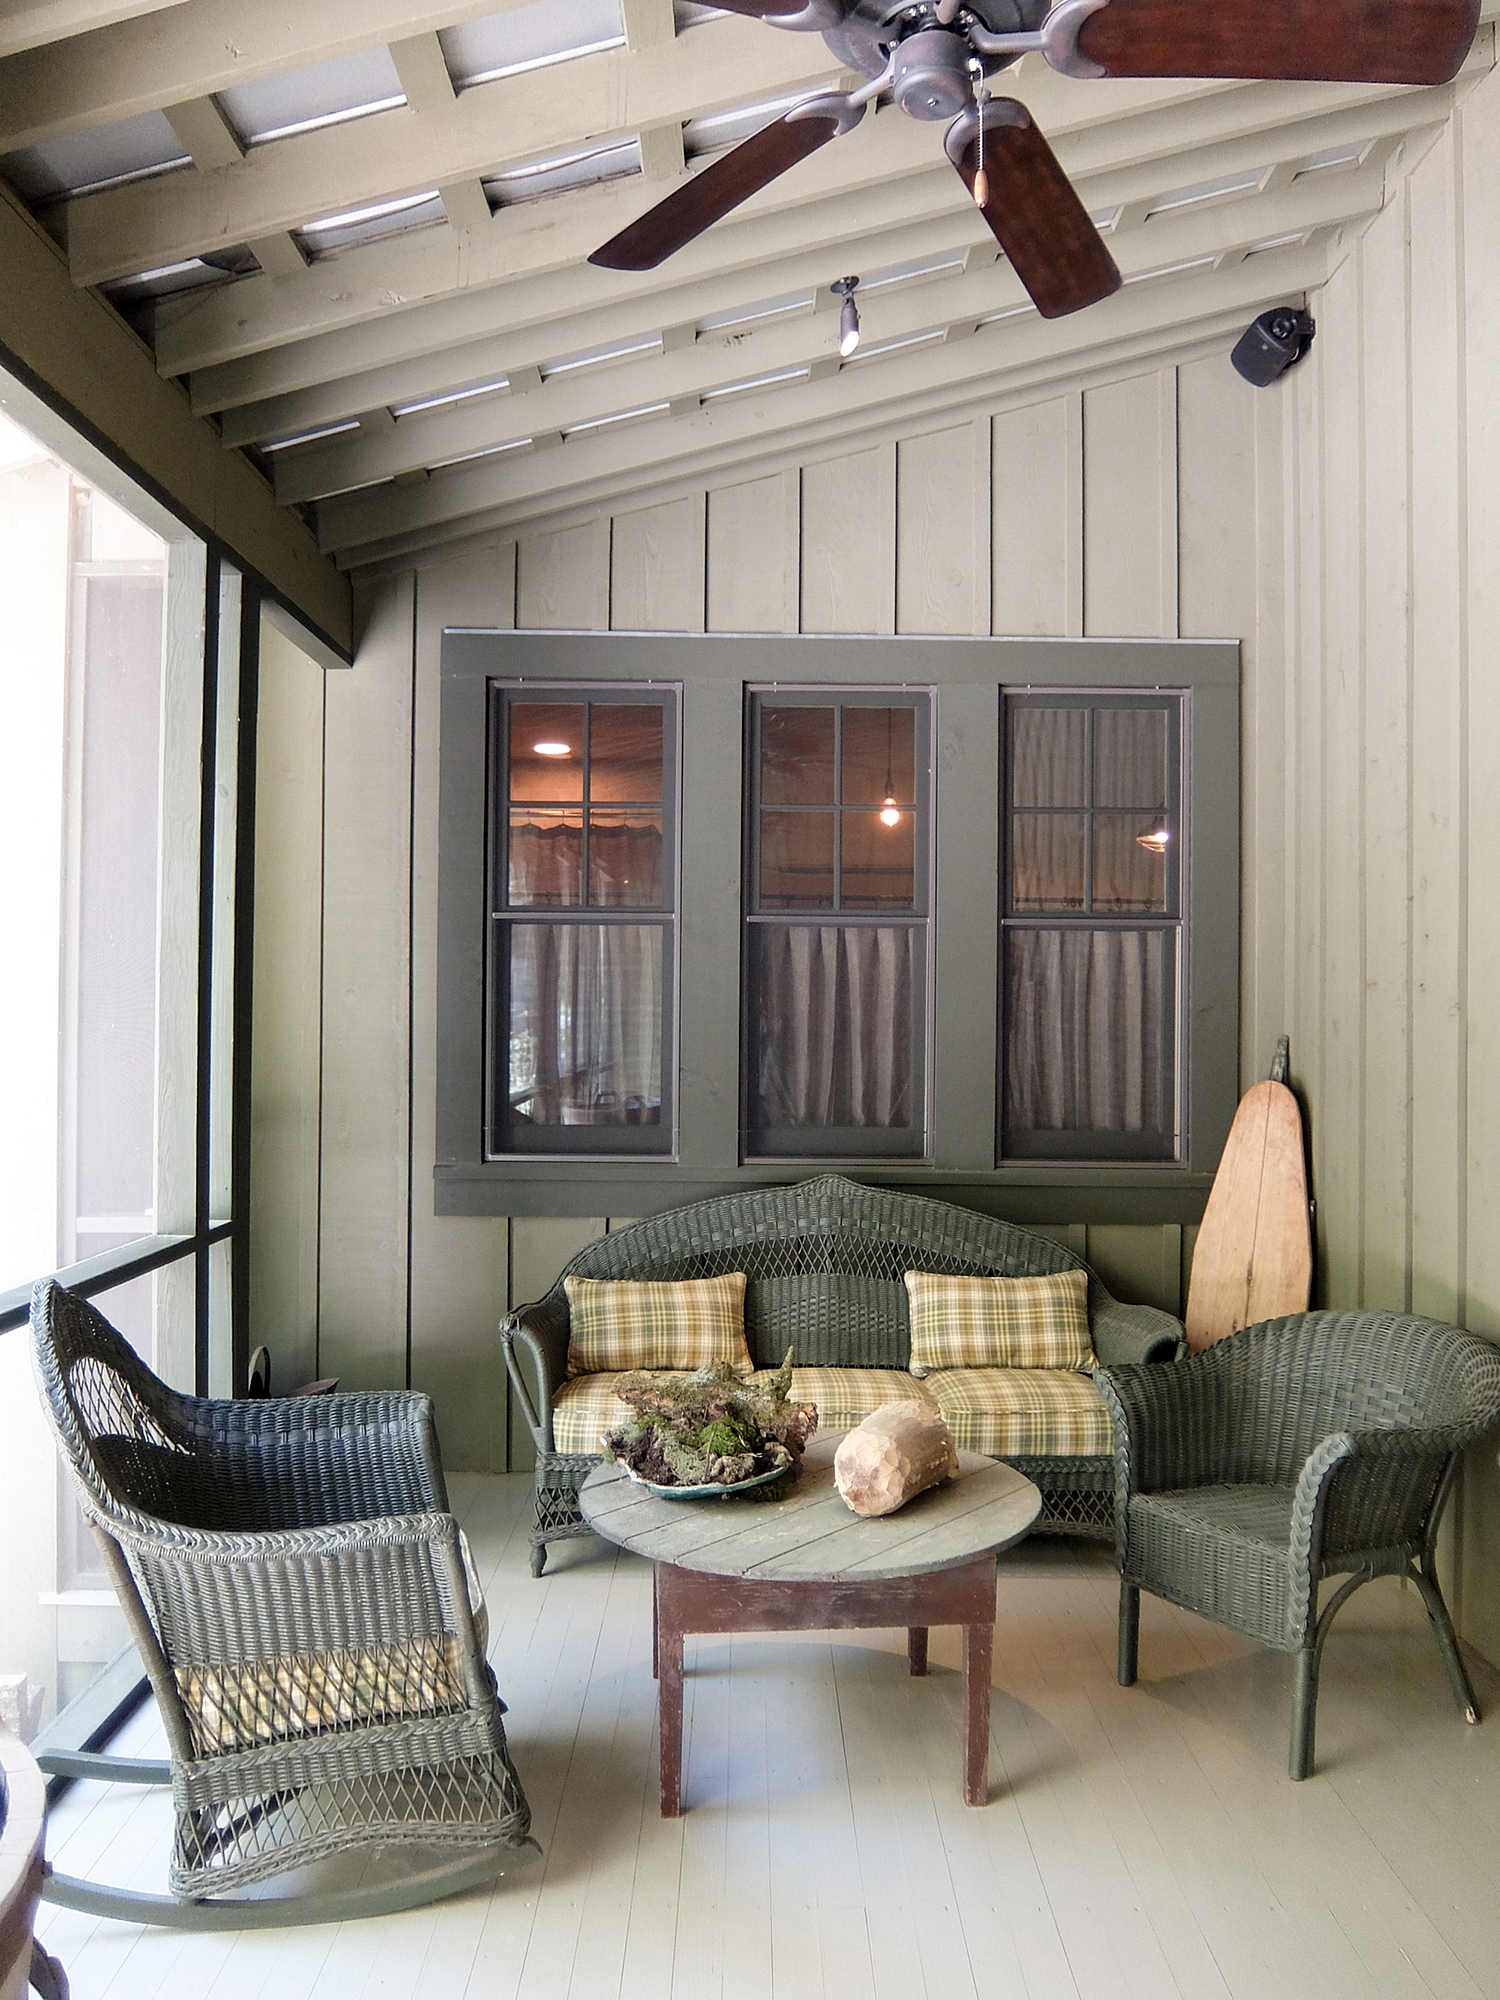 sugar_creek_farm_49_lakehouse_lake_house_back_screened_porch_farmhouse_covered_sitting_room_1500.jpg